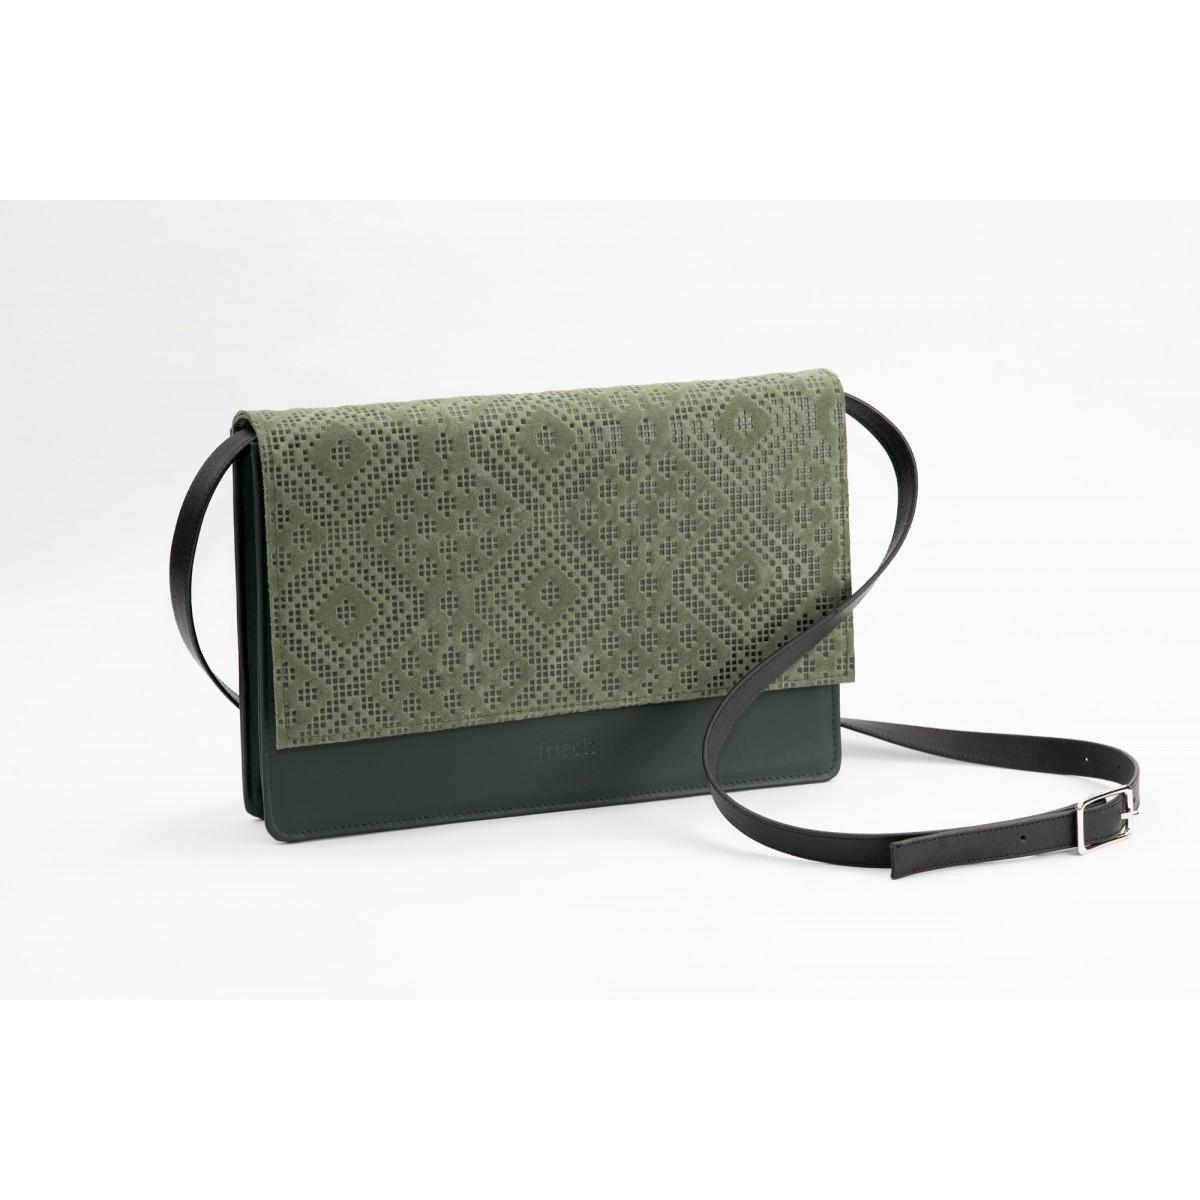 frisch Handtasche COMO